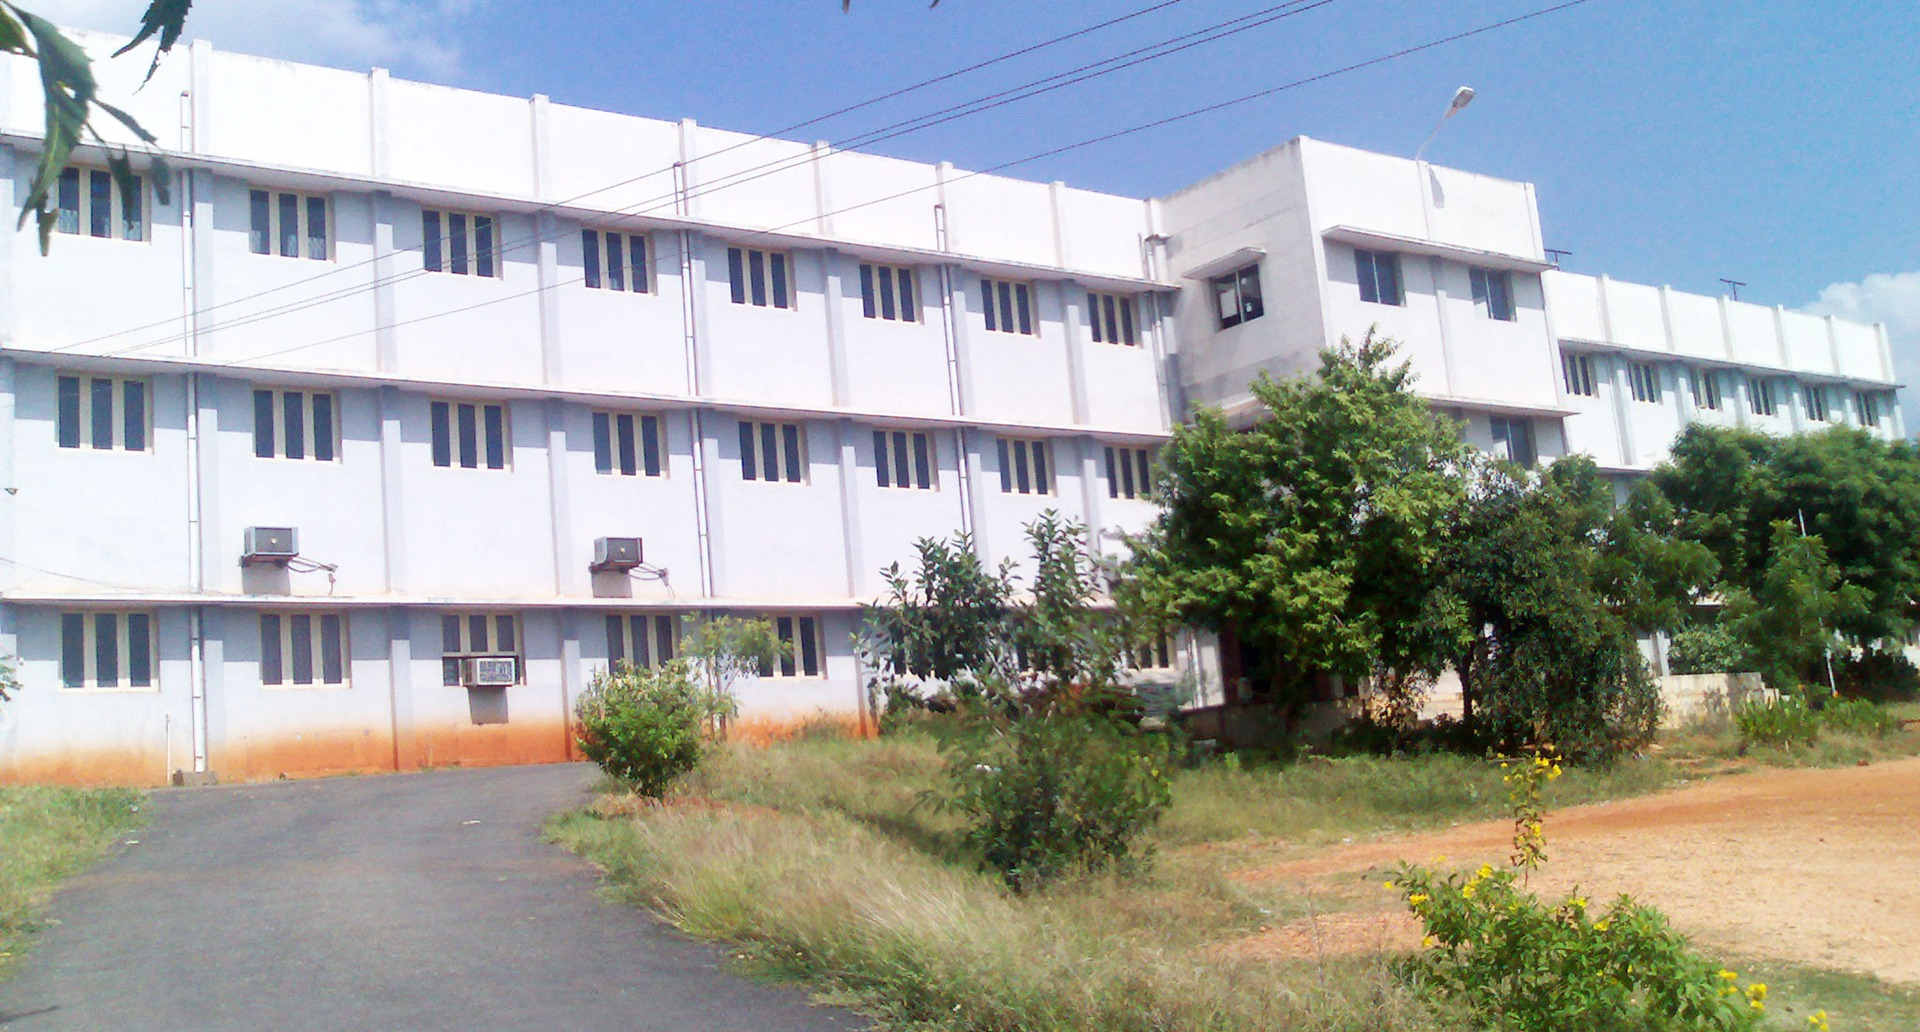 CSI Jeyaraj Annapackiam College of Nursing and Allied Sciences, Madurai Image